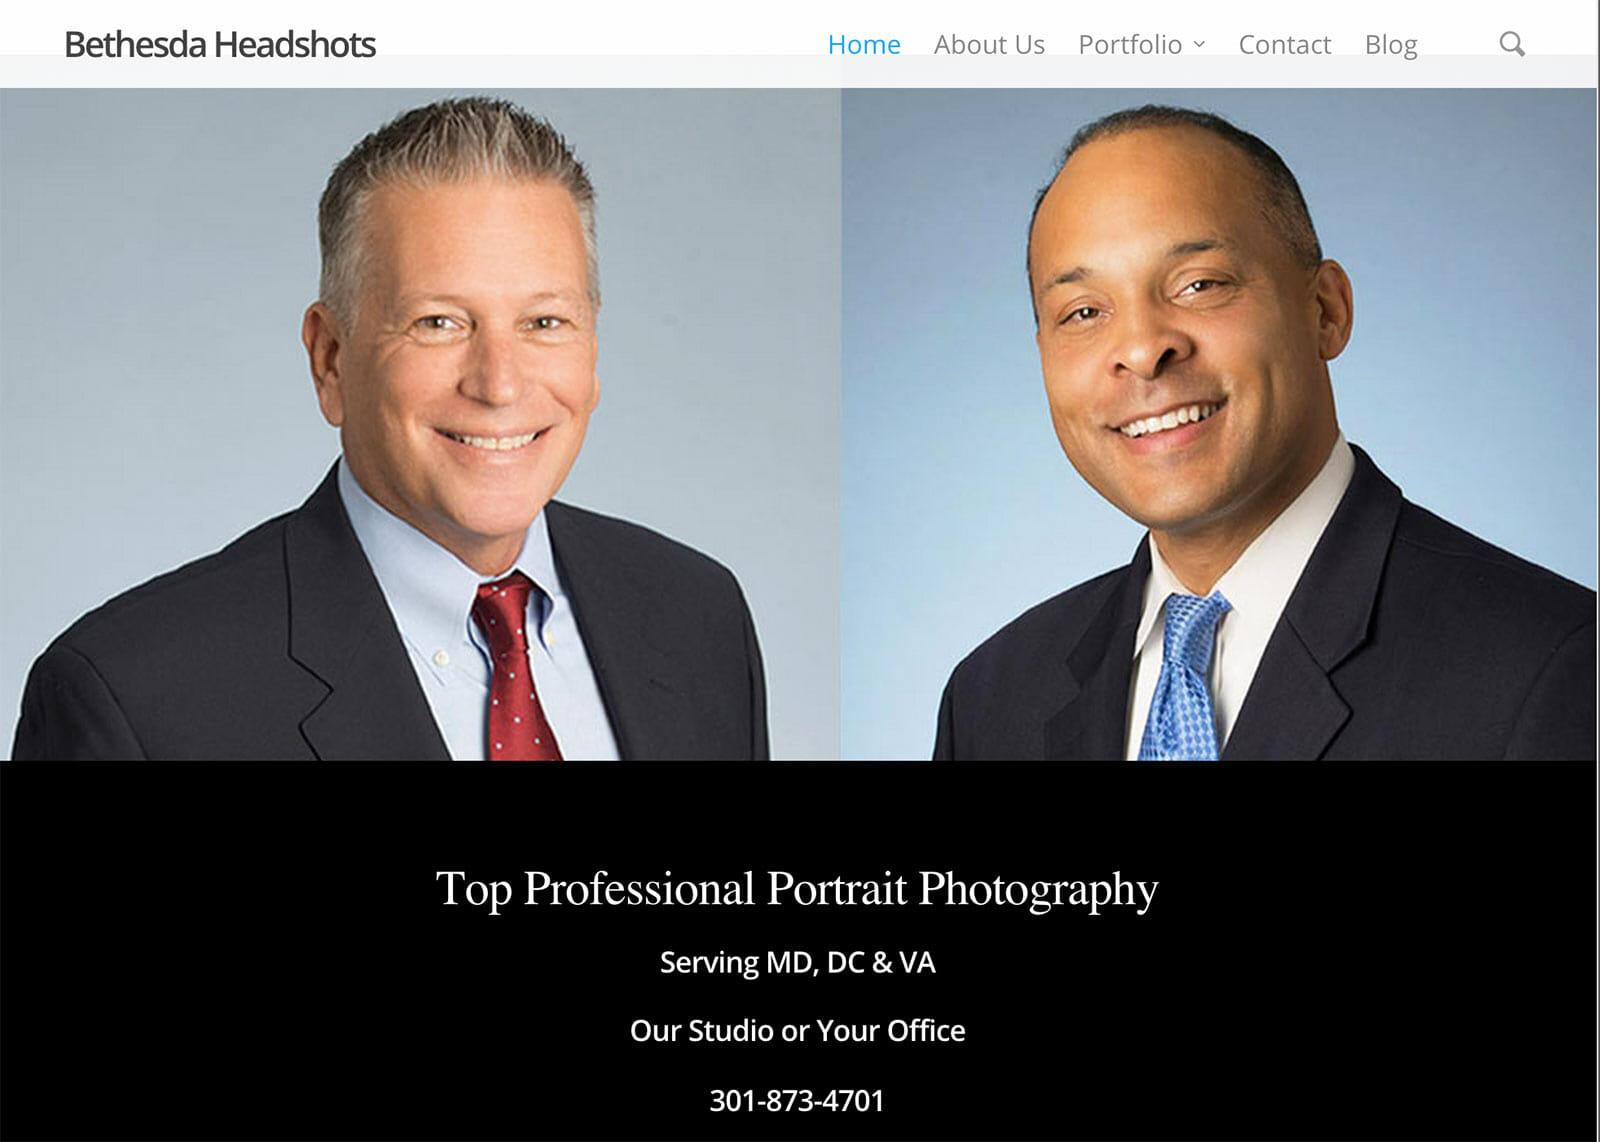 LinkedIn Profile Image Career Enhancement